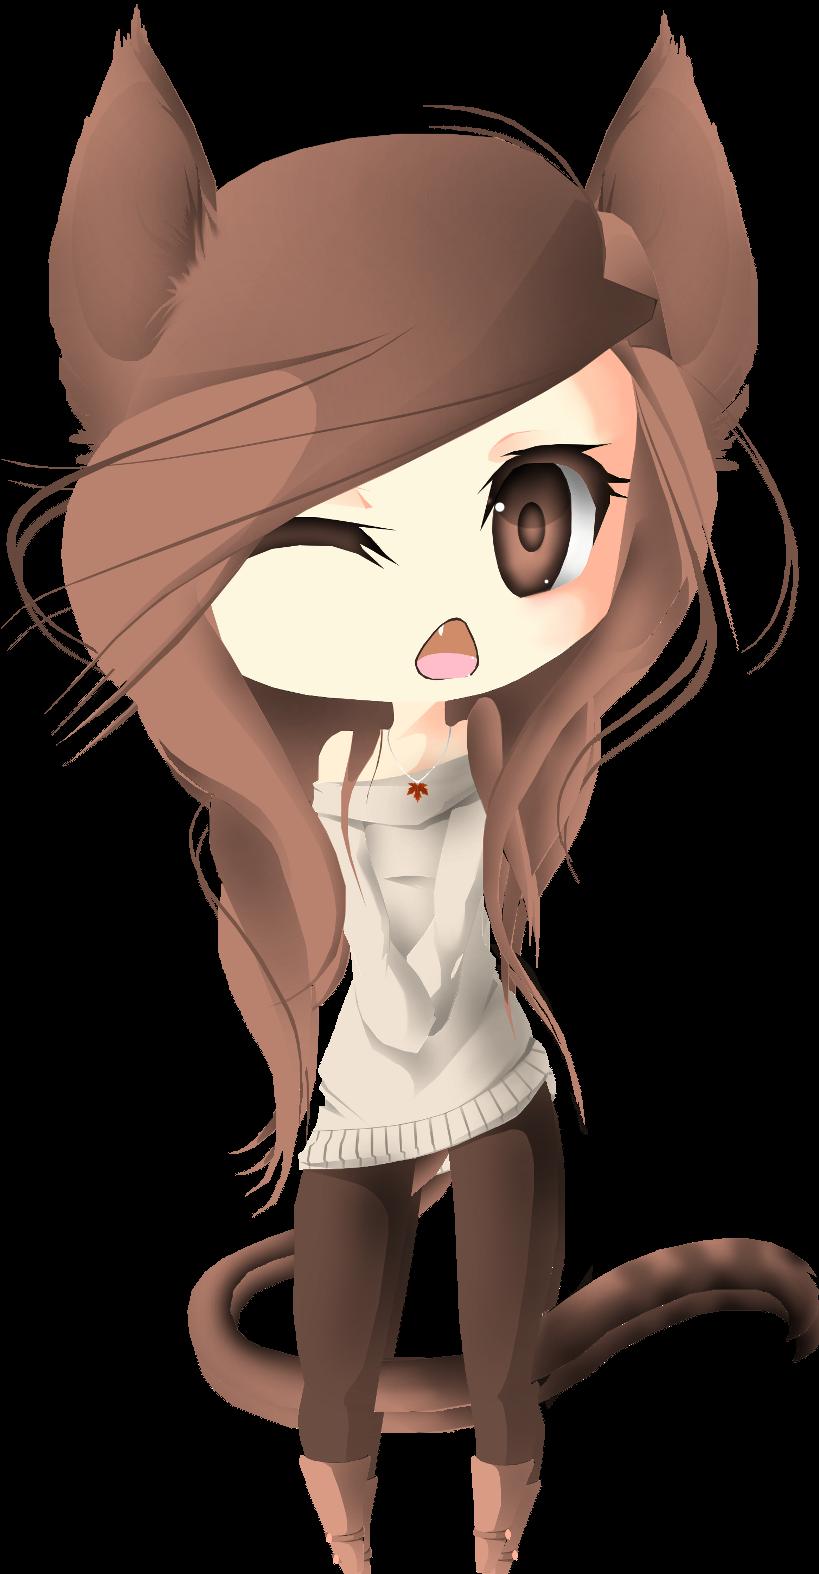 Chibi Neko by Puppypaww on DeviantArt  |Chibi Anime Neko Girl